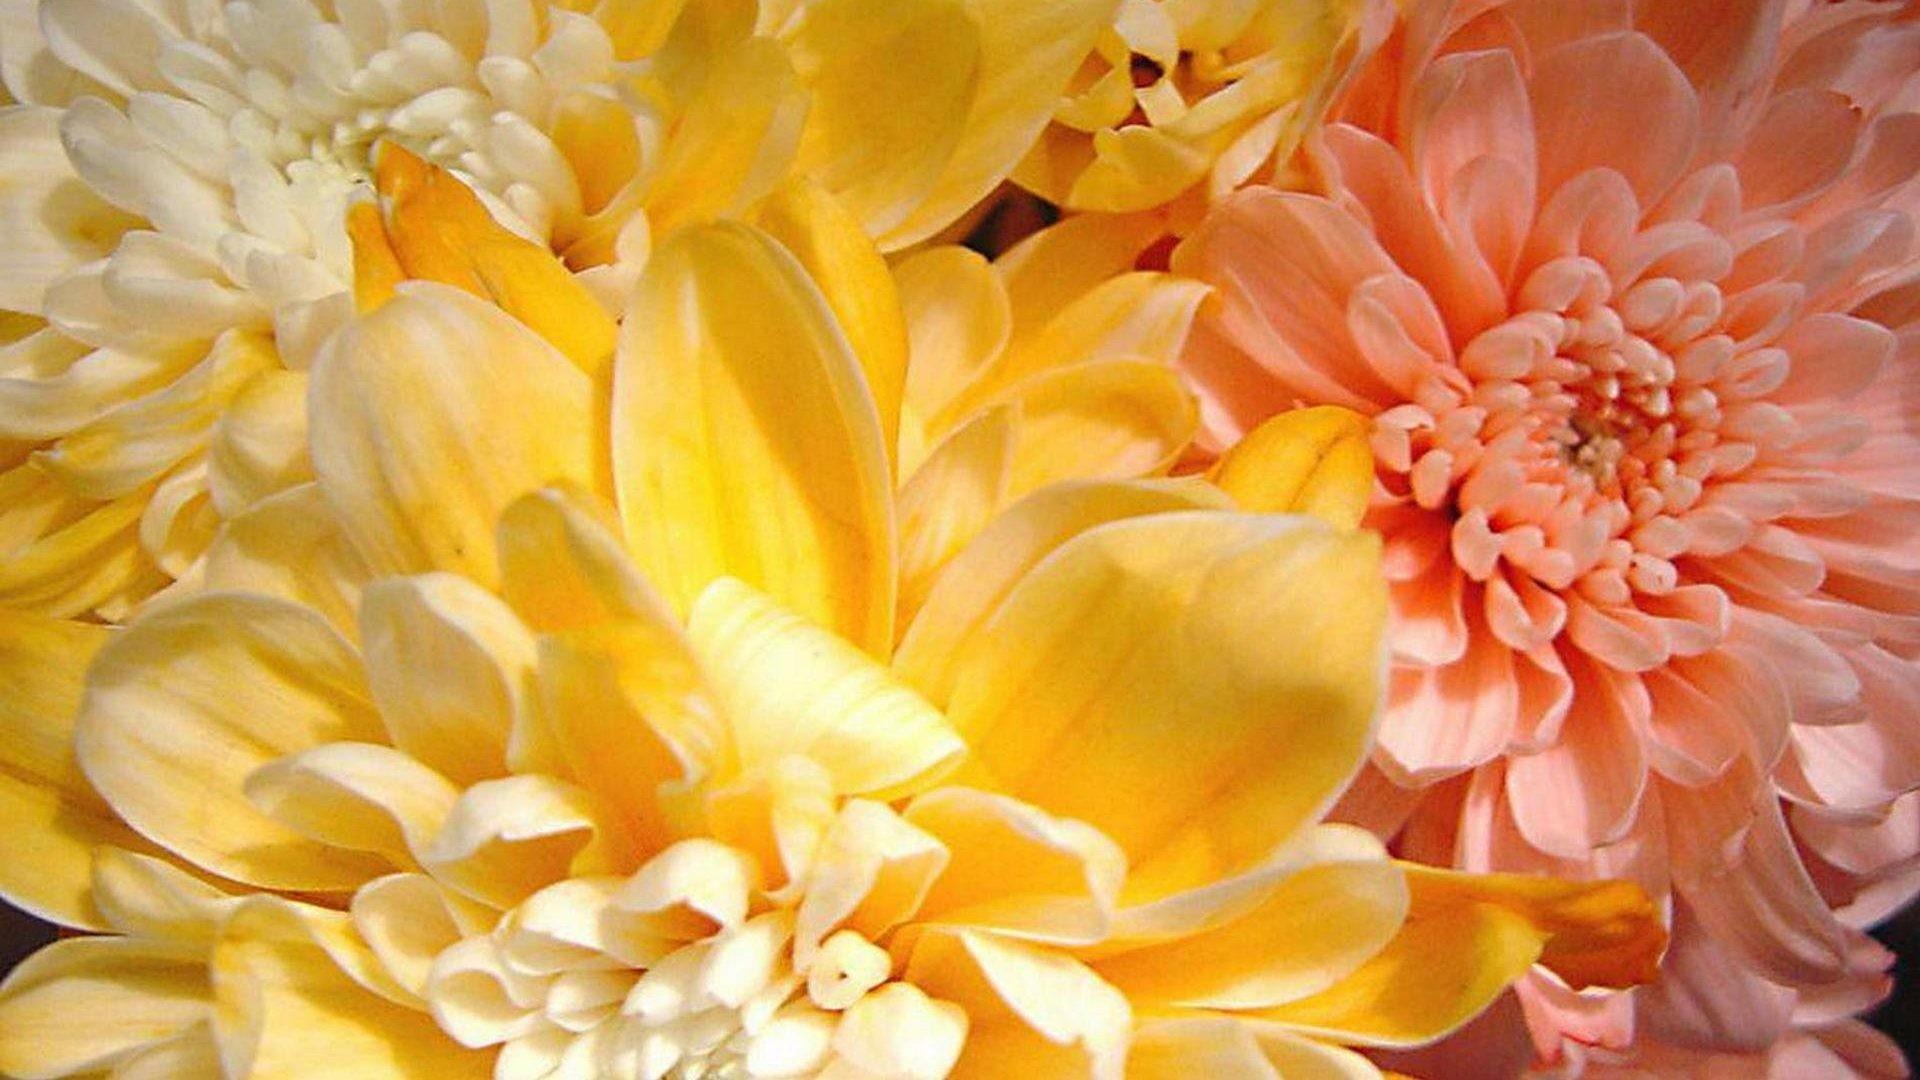 Flowers – Plants Beautiful Colorful Flower Garden Soft Flowers Spring  Delicate Nature Petals Wallpaper Pc Hd